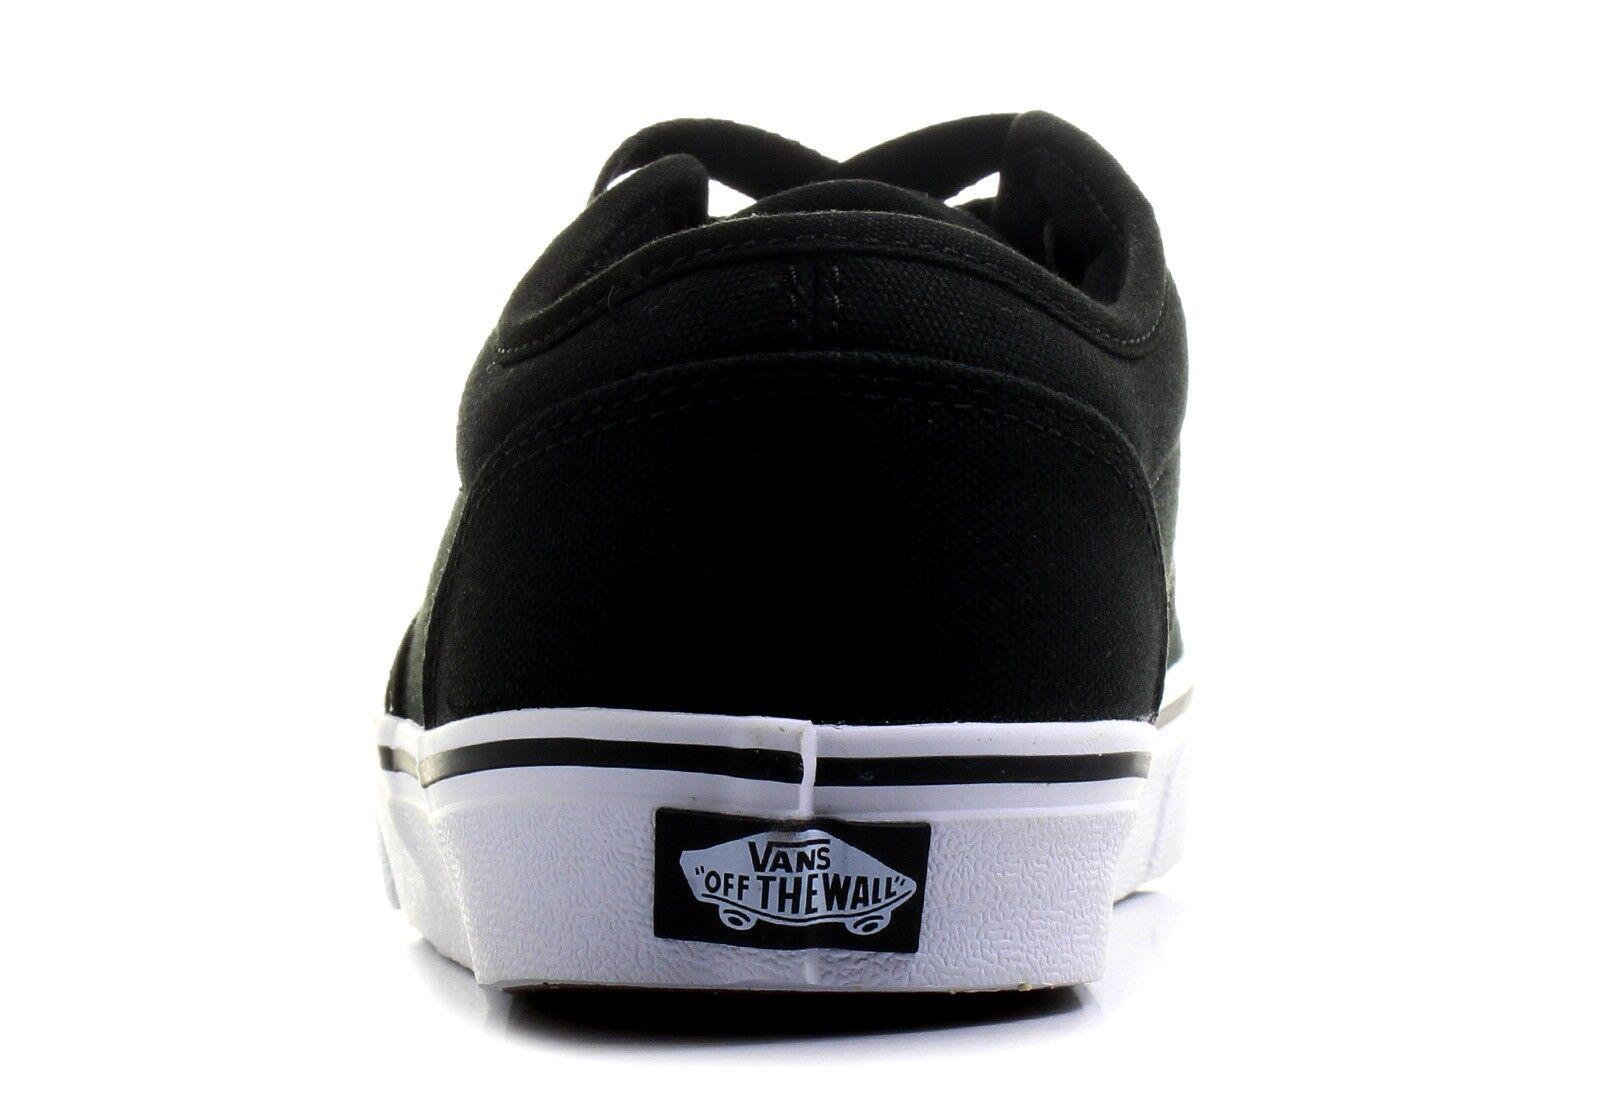 Vans Atwood Scarpe Da Uomo Vulcanizzata Scarpe Da Scarpe Ginnastica Da Skate Nero/Bianco Taglie: e22b10